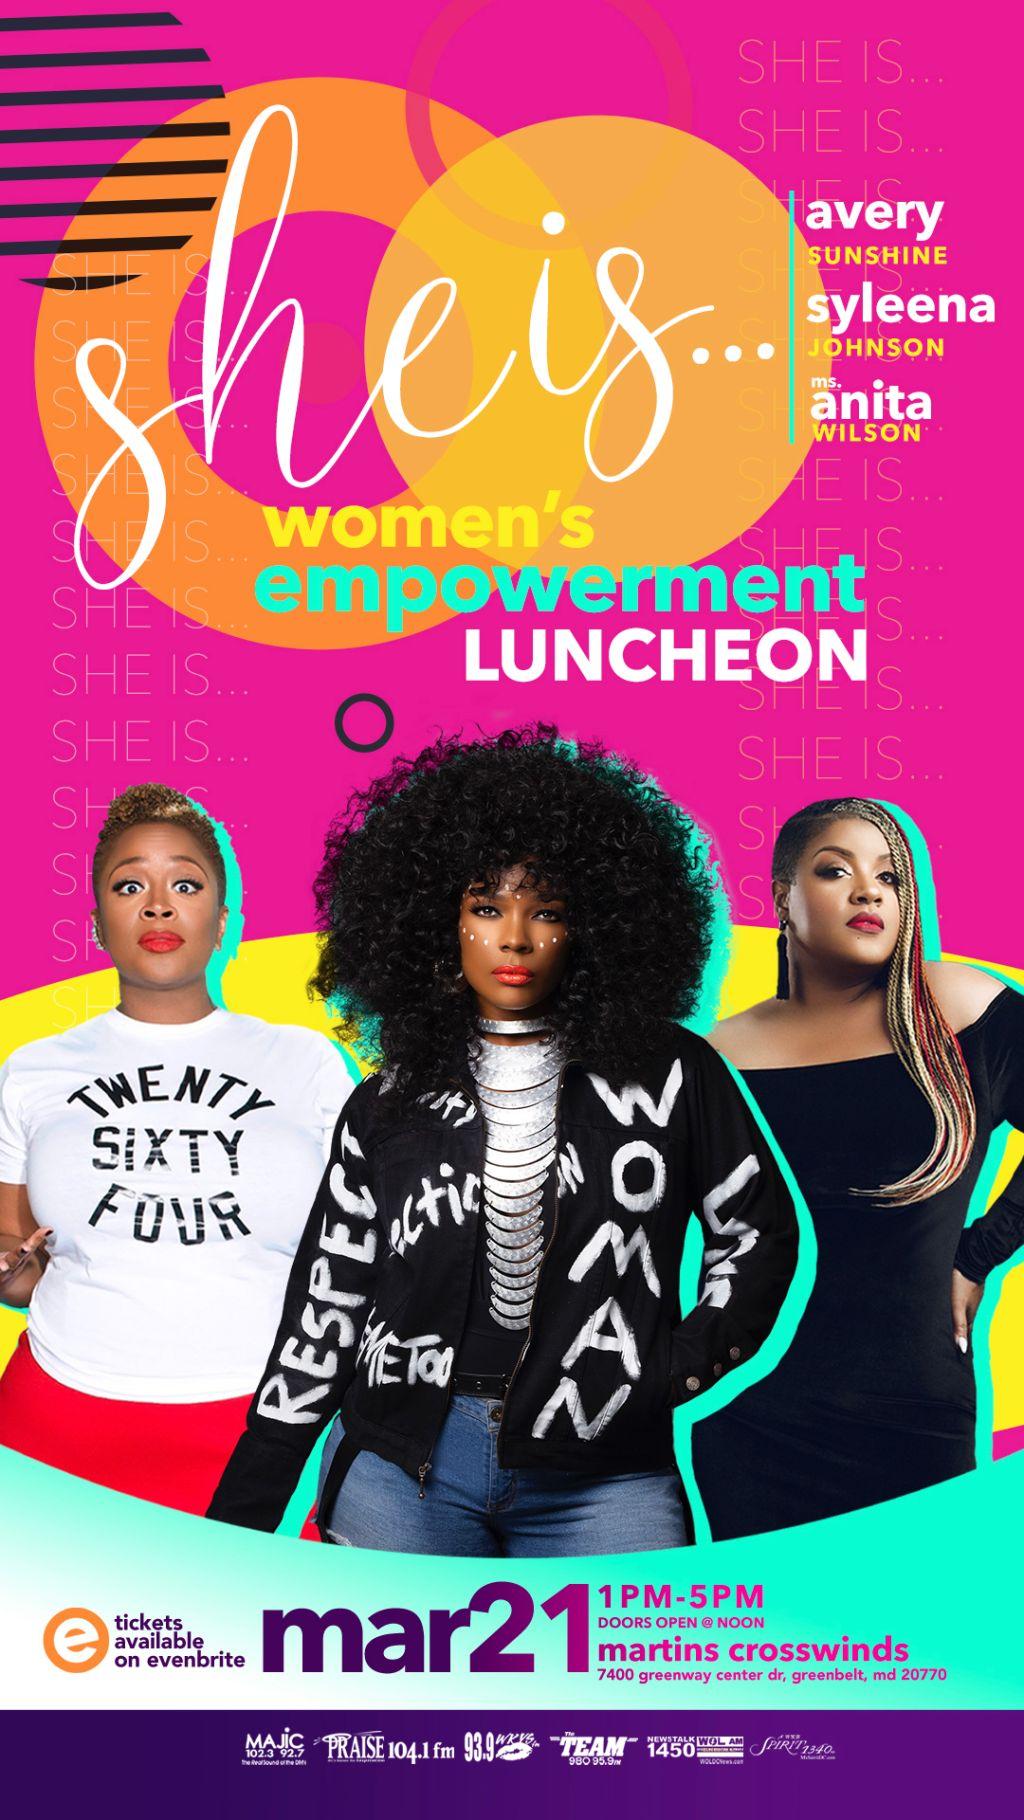 SHE IS Women's Empowerment Luncheon